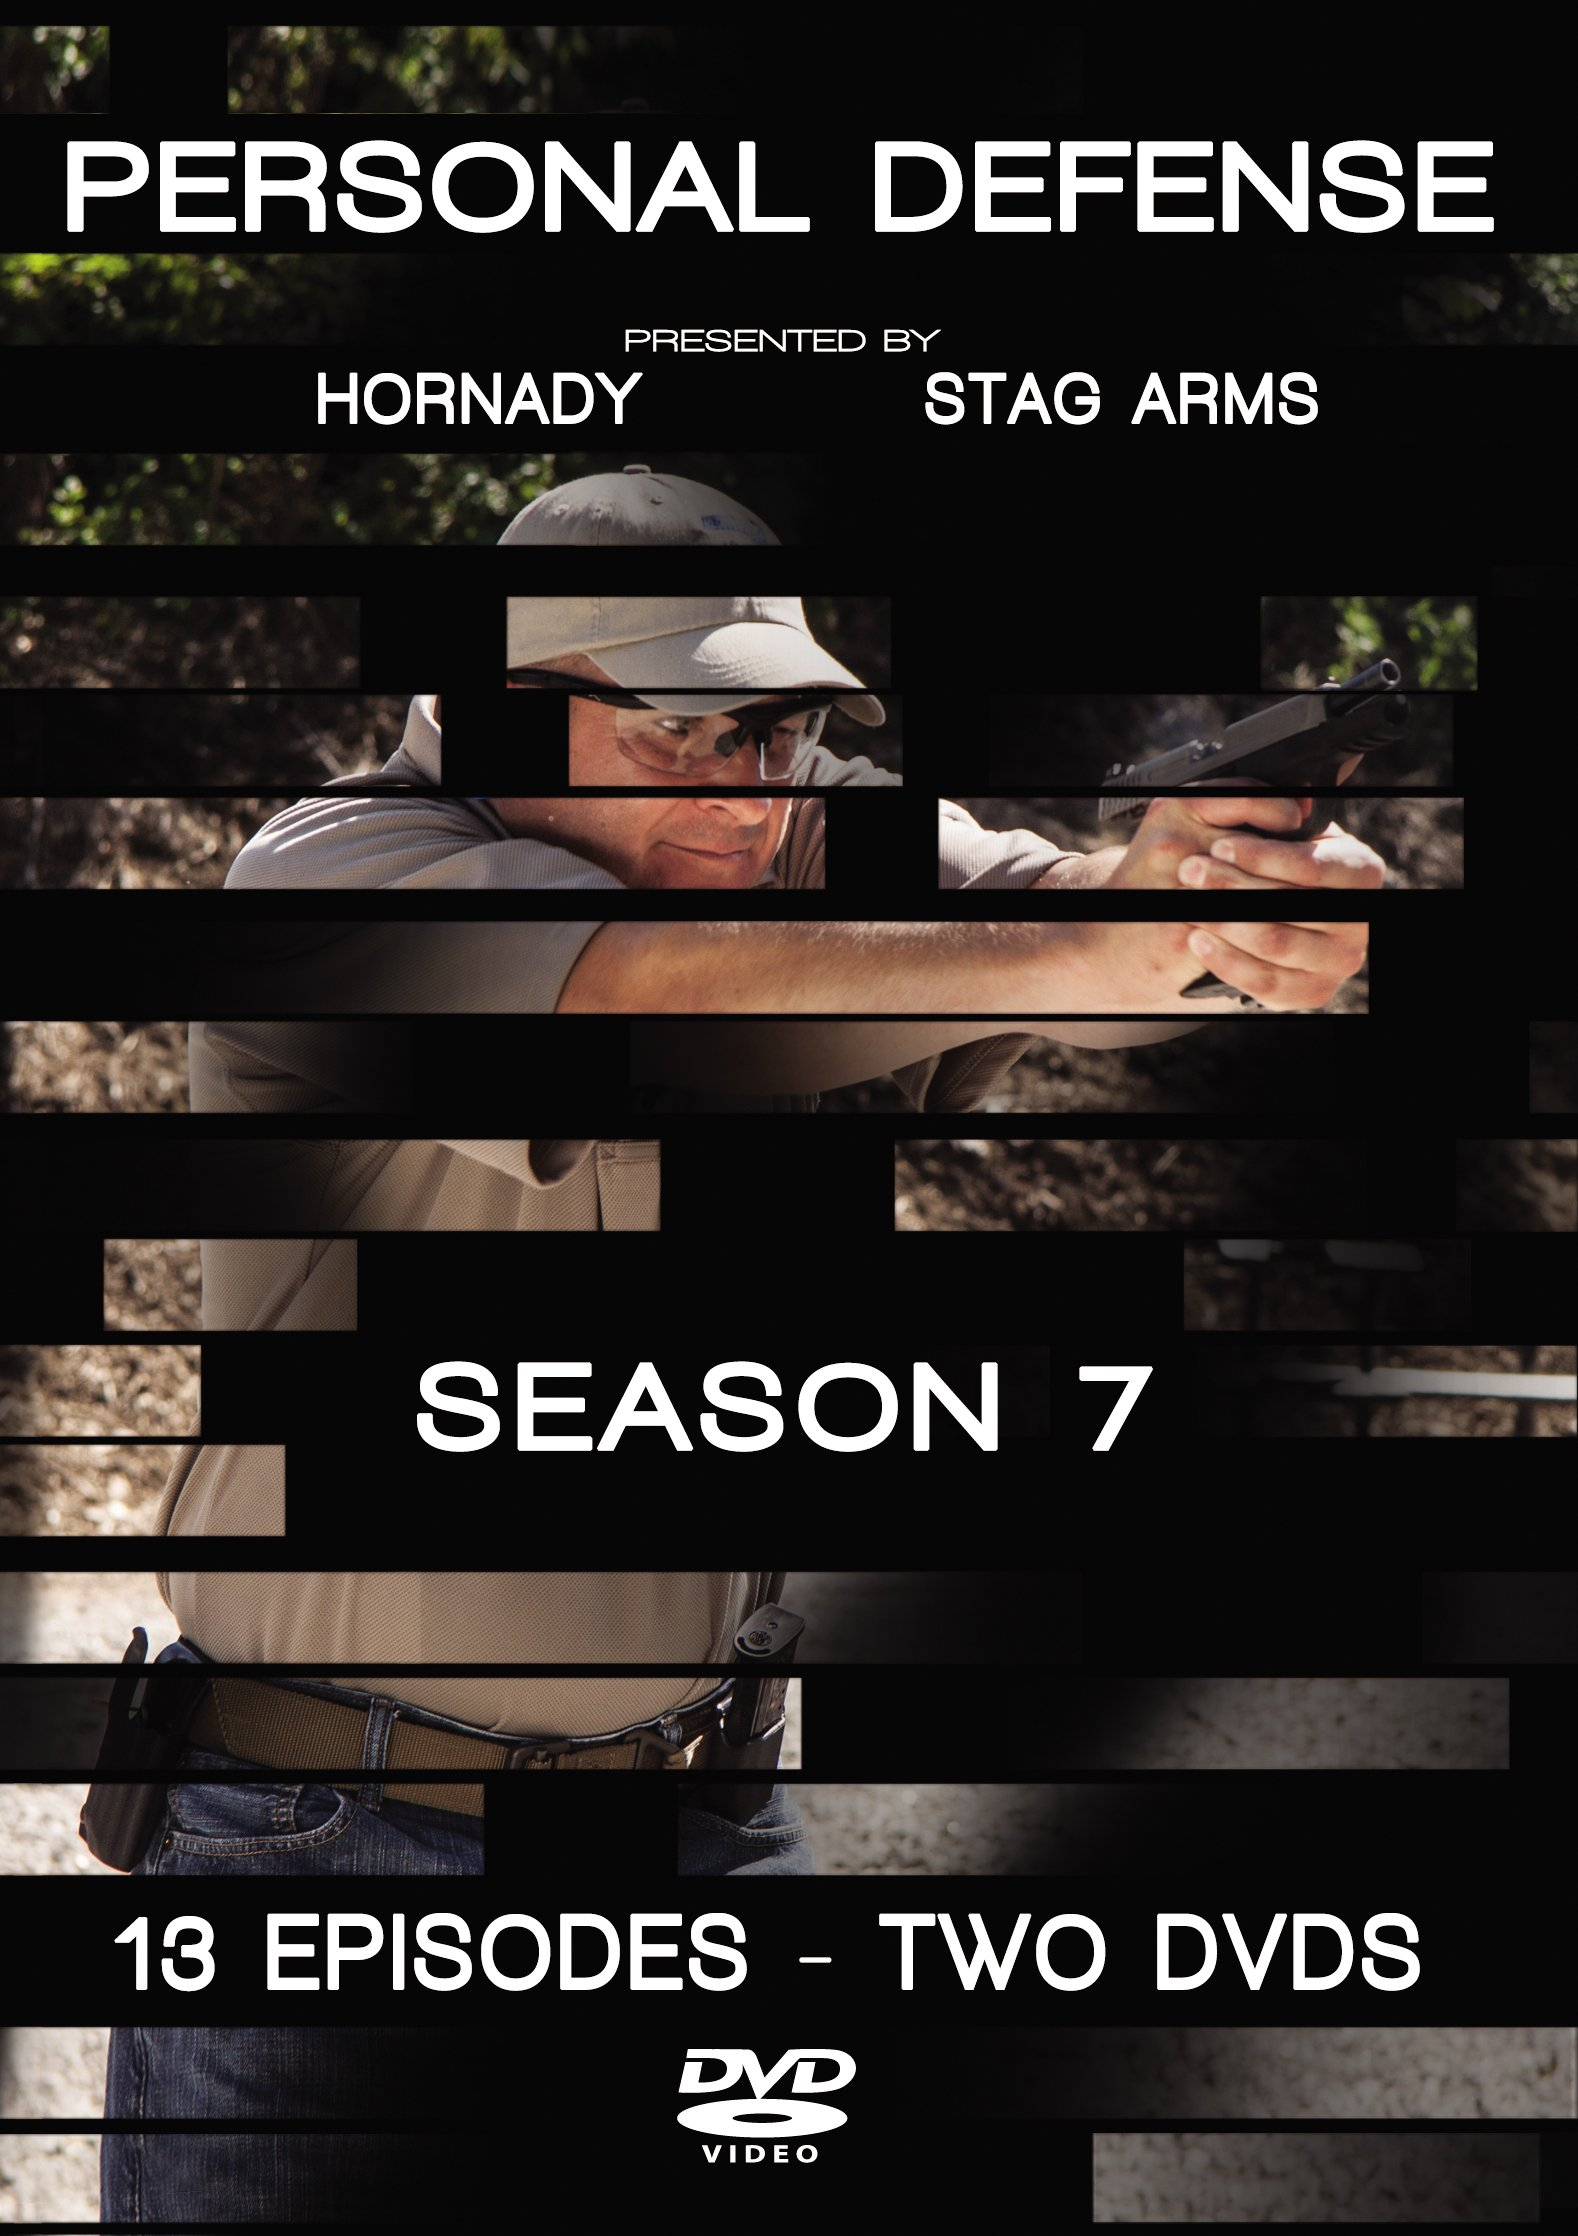 Personal Defense TV Season 7 (2012) 2 DVD Set